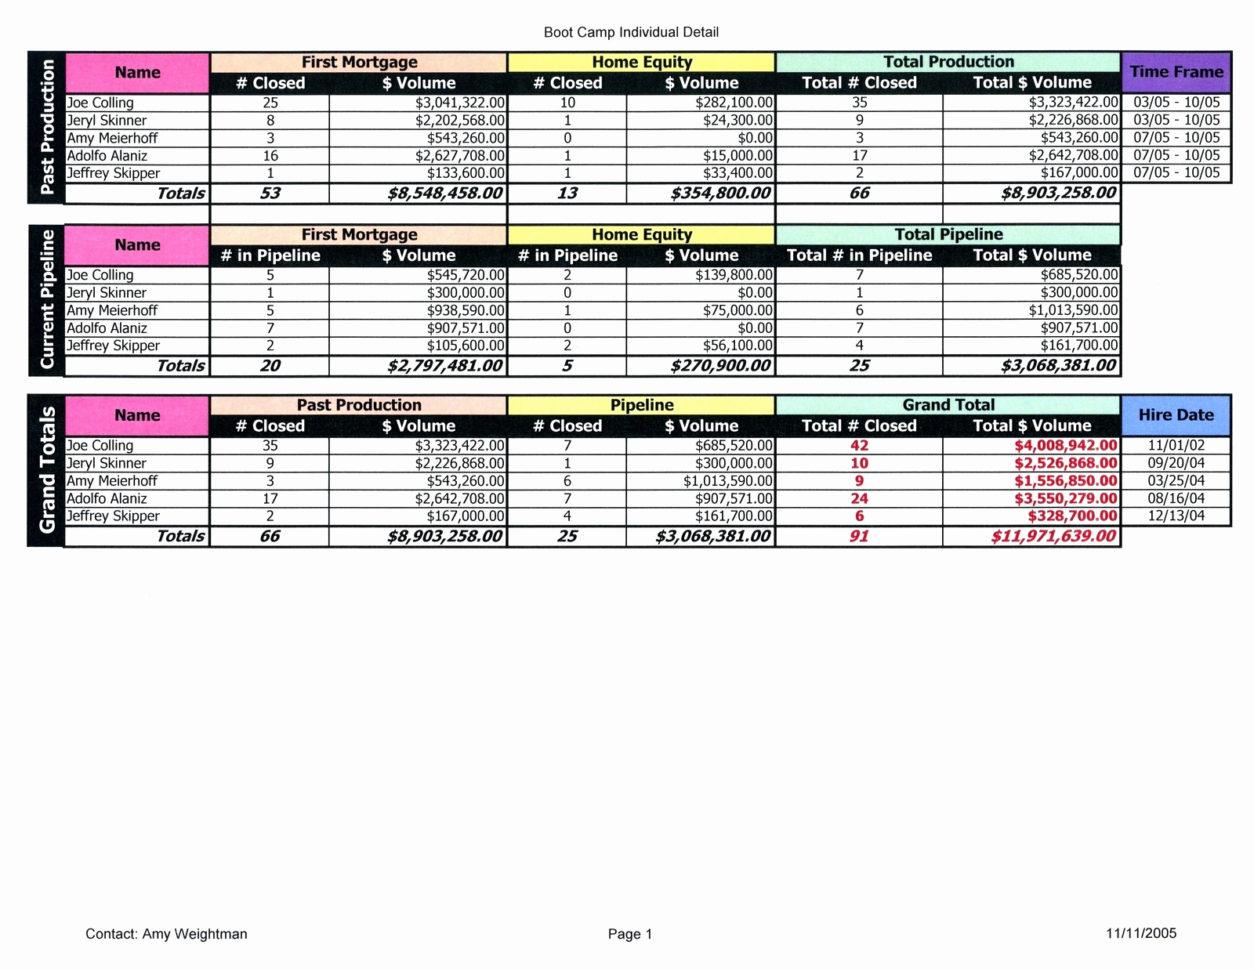 Employee Relations Tracking Spreadsheet Template In Employee Point System Spreadsheet New Employee Relations Tracking